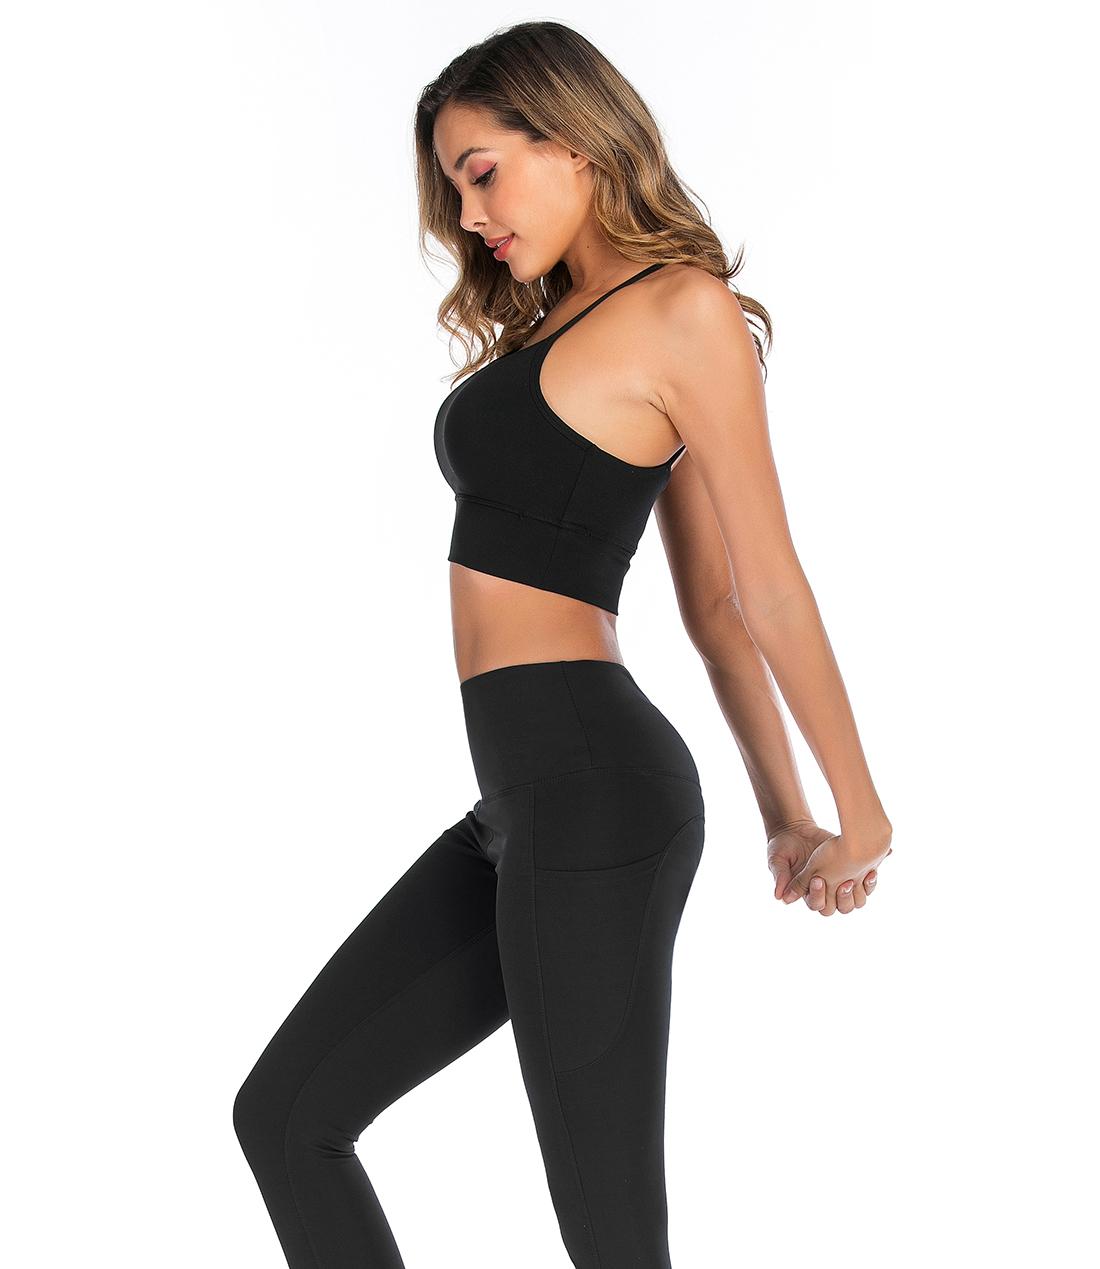 SESEASUN gym fitness yoga hosen seite tasche steigbügel sexy butt lift private label nahtlose leggings